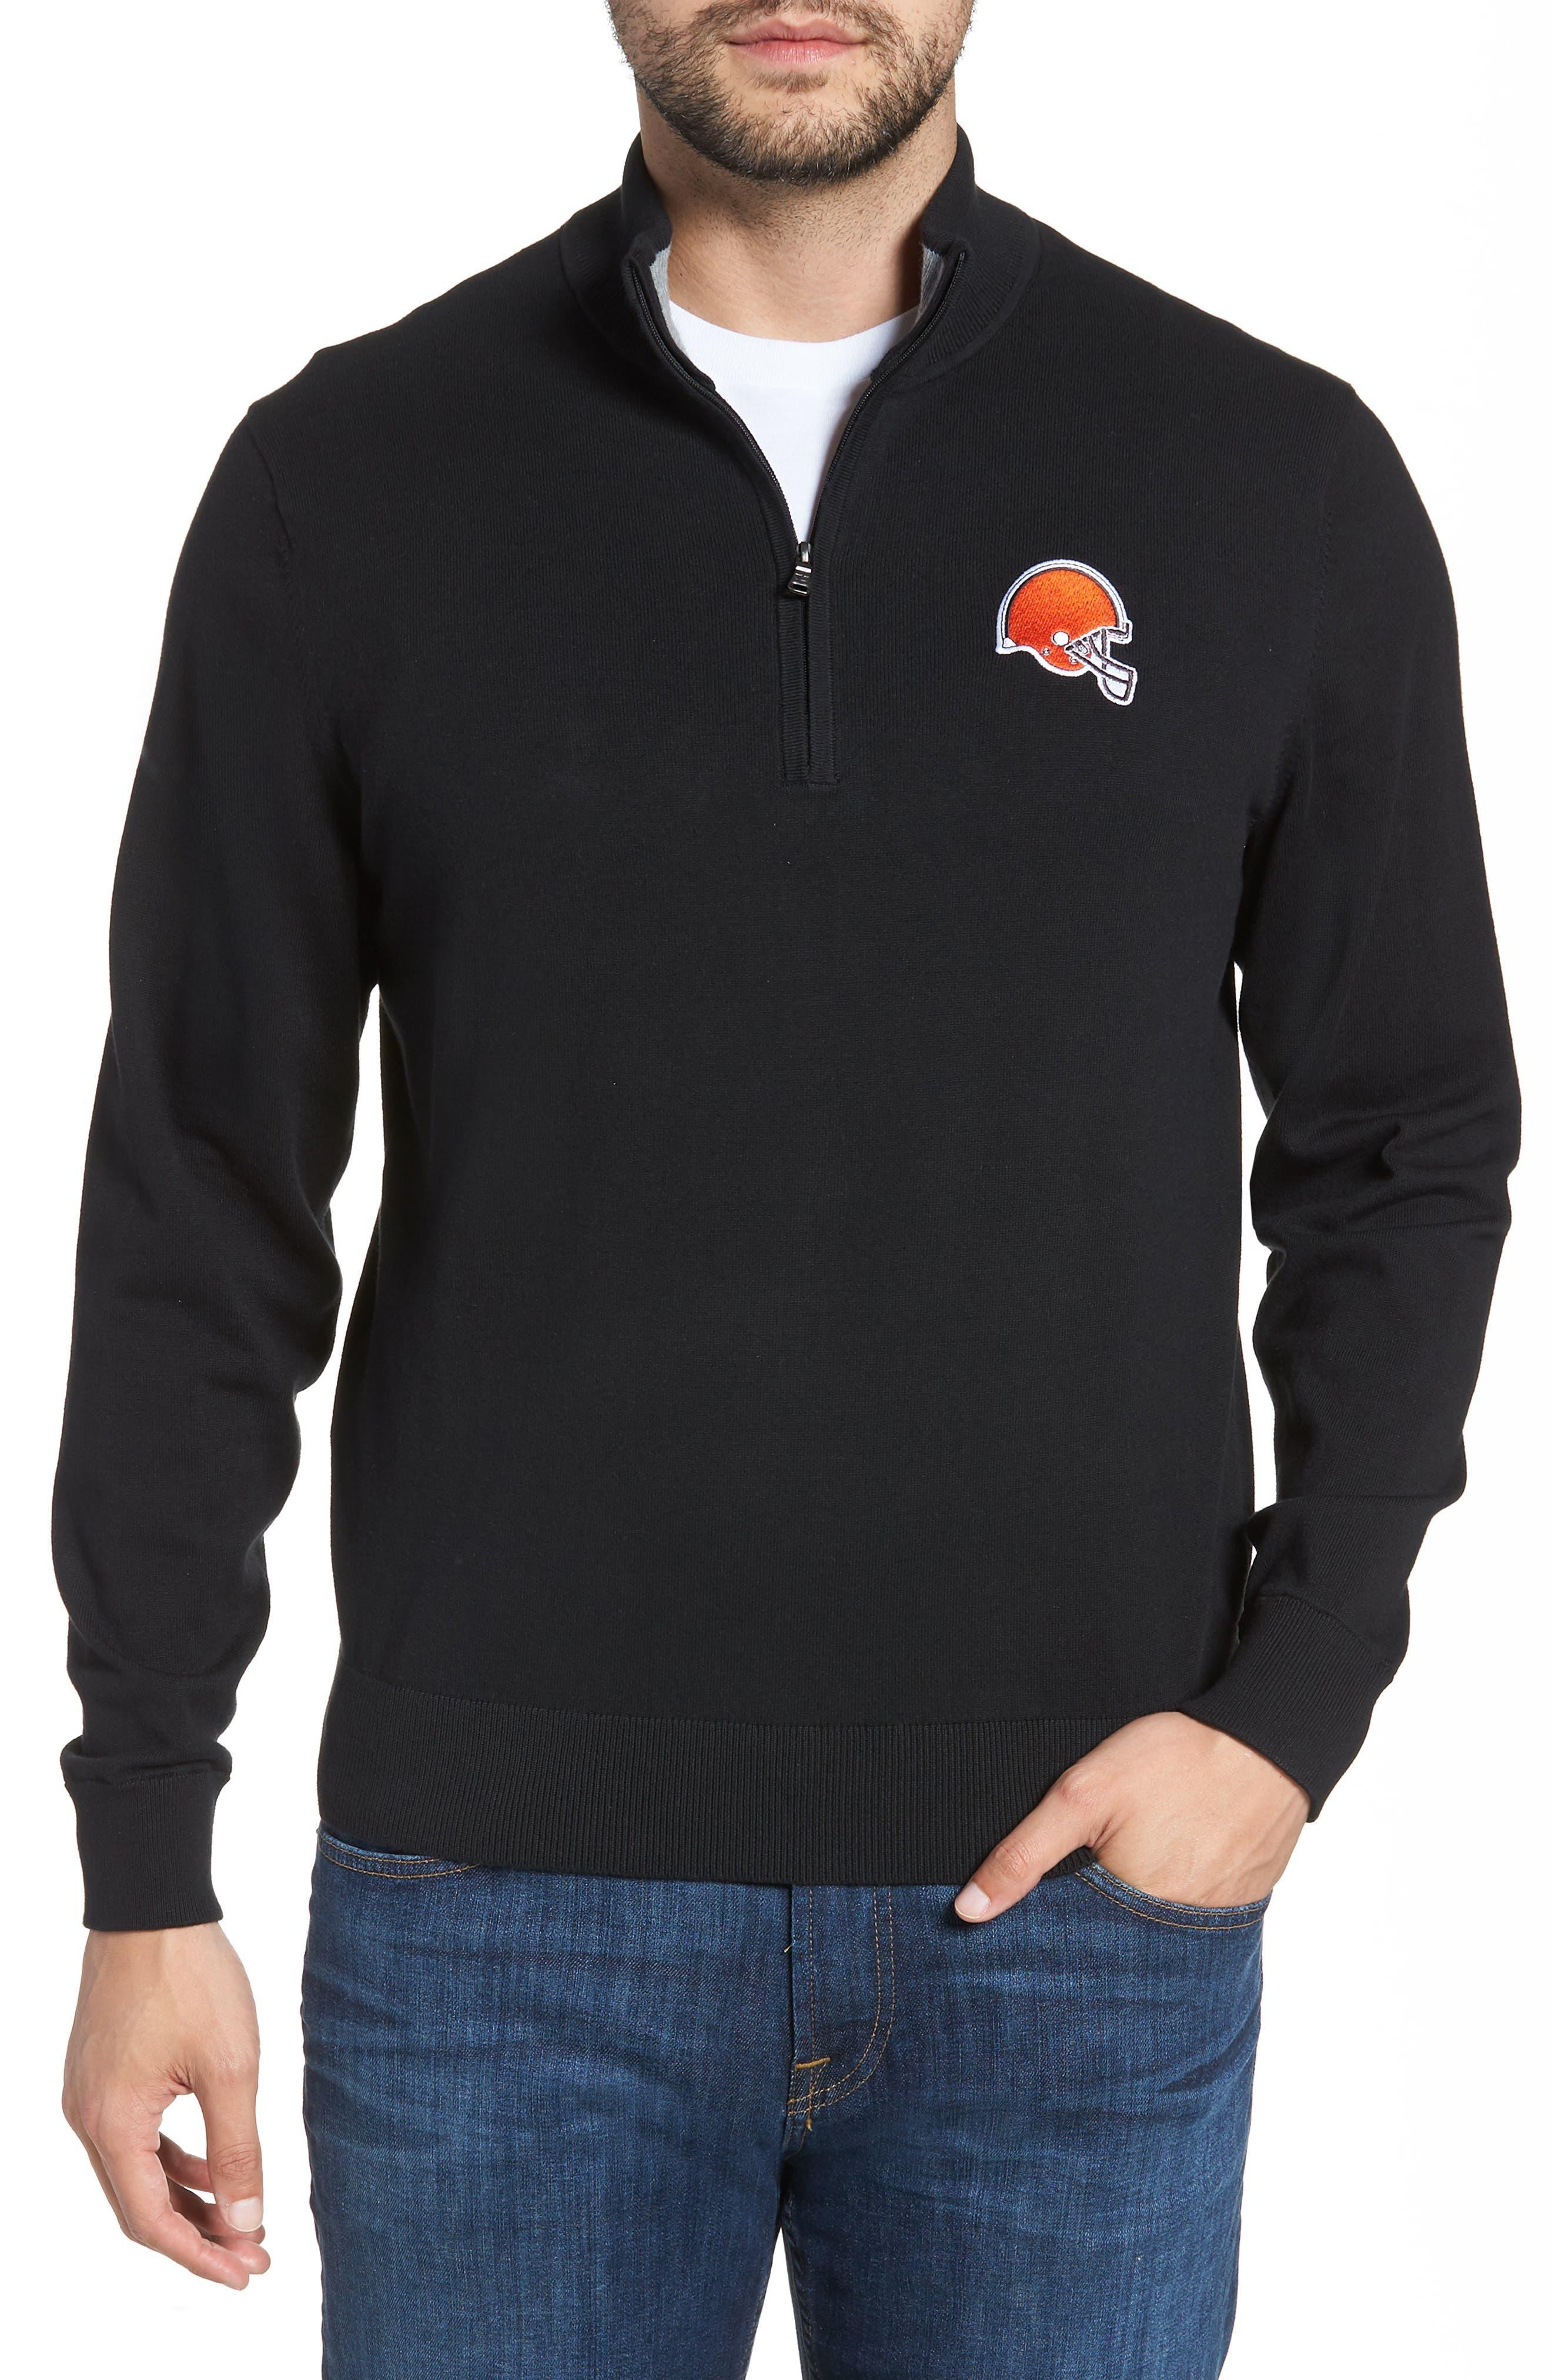 Cleveland Browns - Lakemont Regular Fit Quarter Zip Sweater,                             Main thumbnail 1, color,                             BLACK